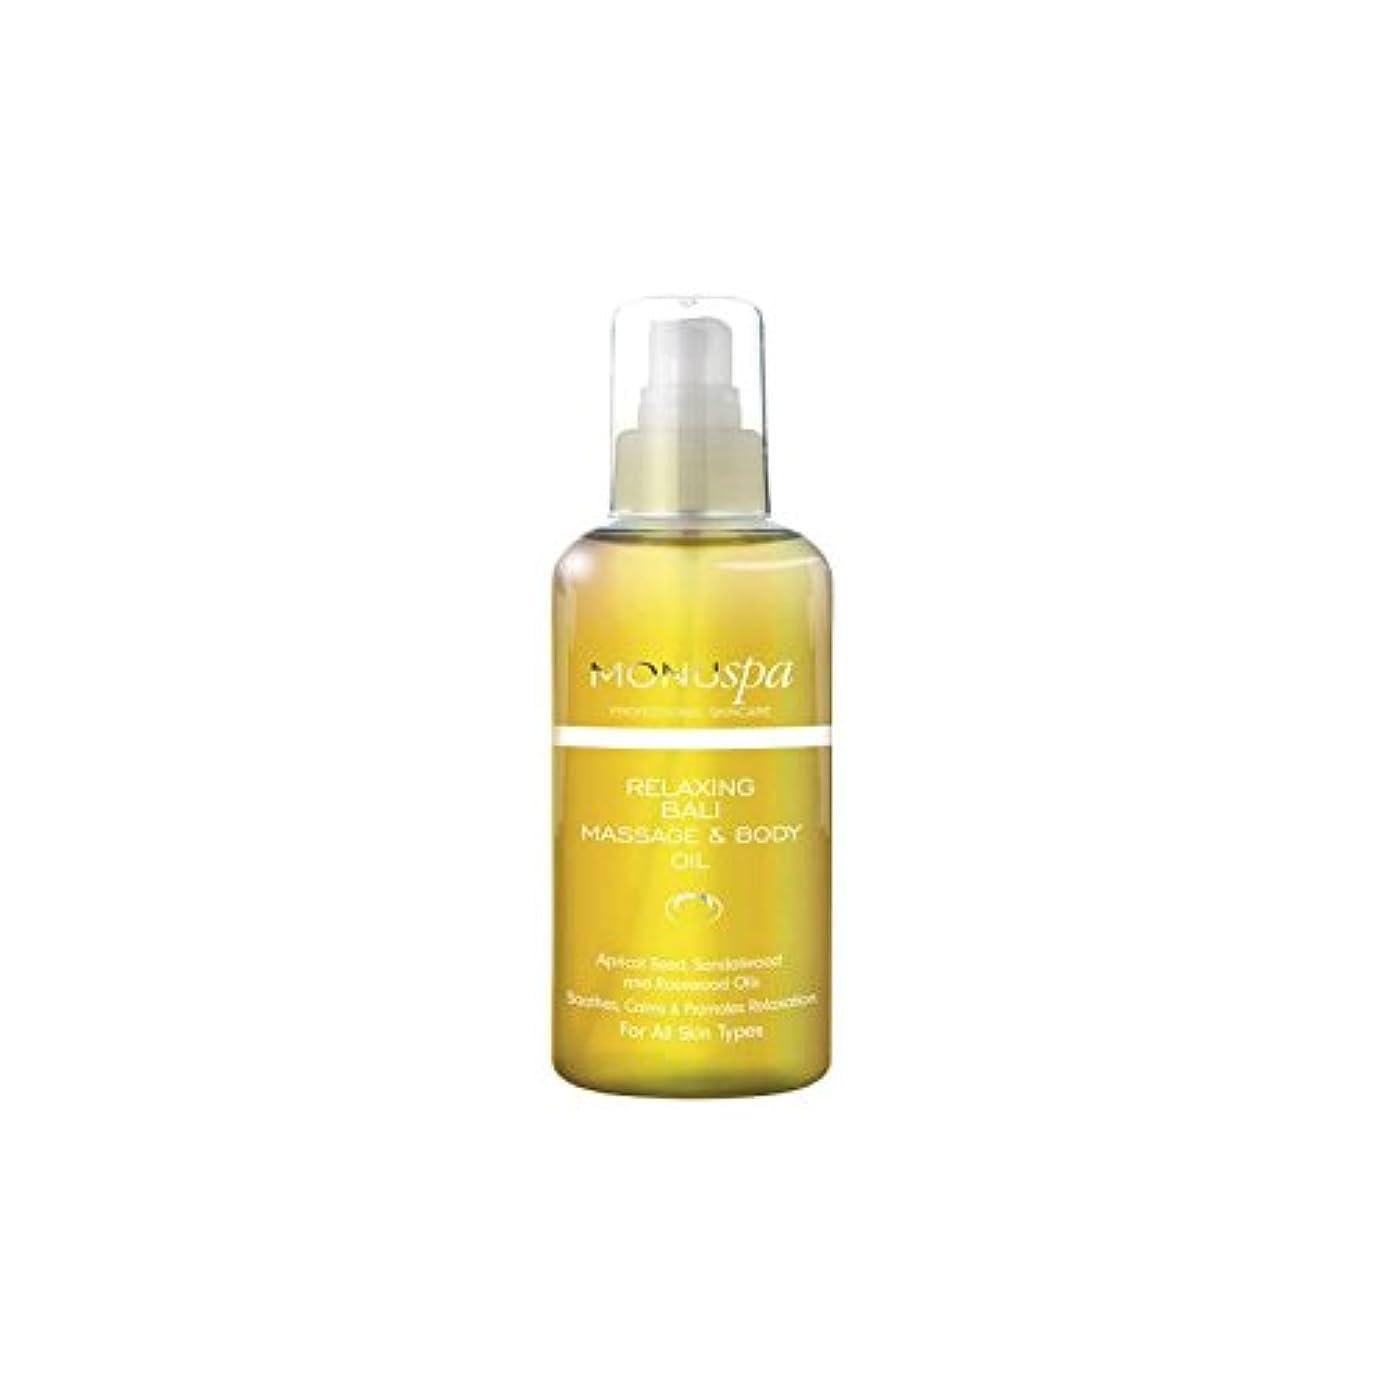 MONUspa Relaxing Bali Body Oil 100ml (Pack of 6) - バリボディオイル100ミリリットルを緩和 x6 [並行輸入品]